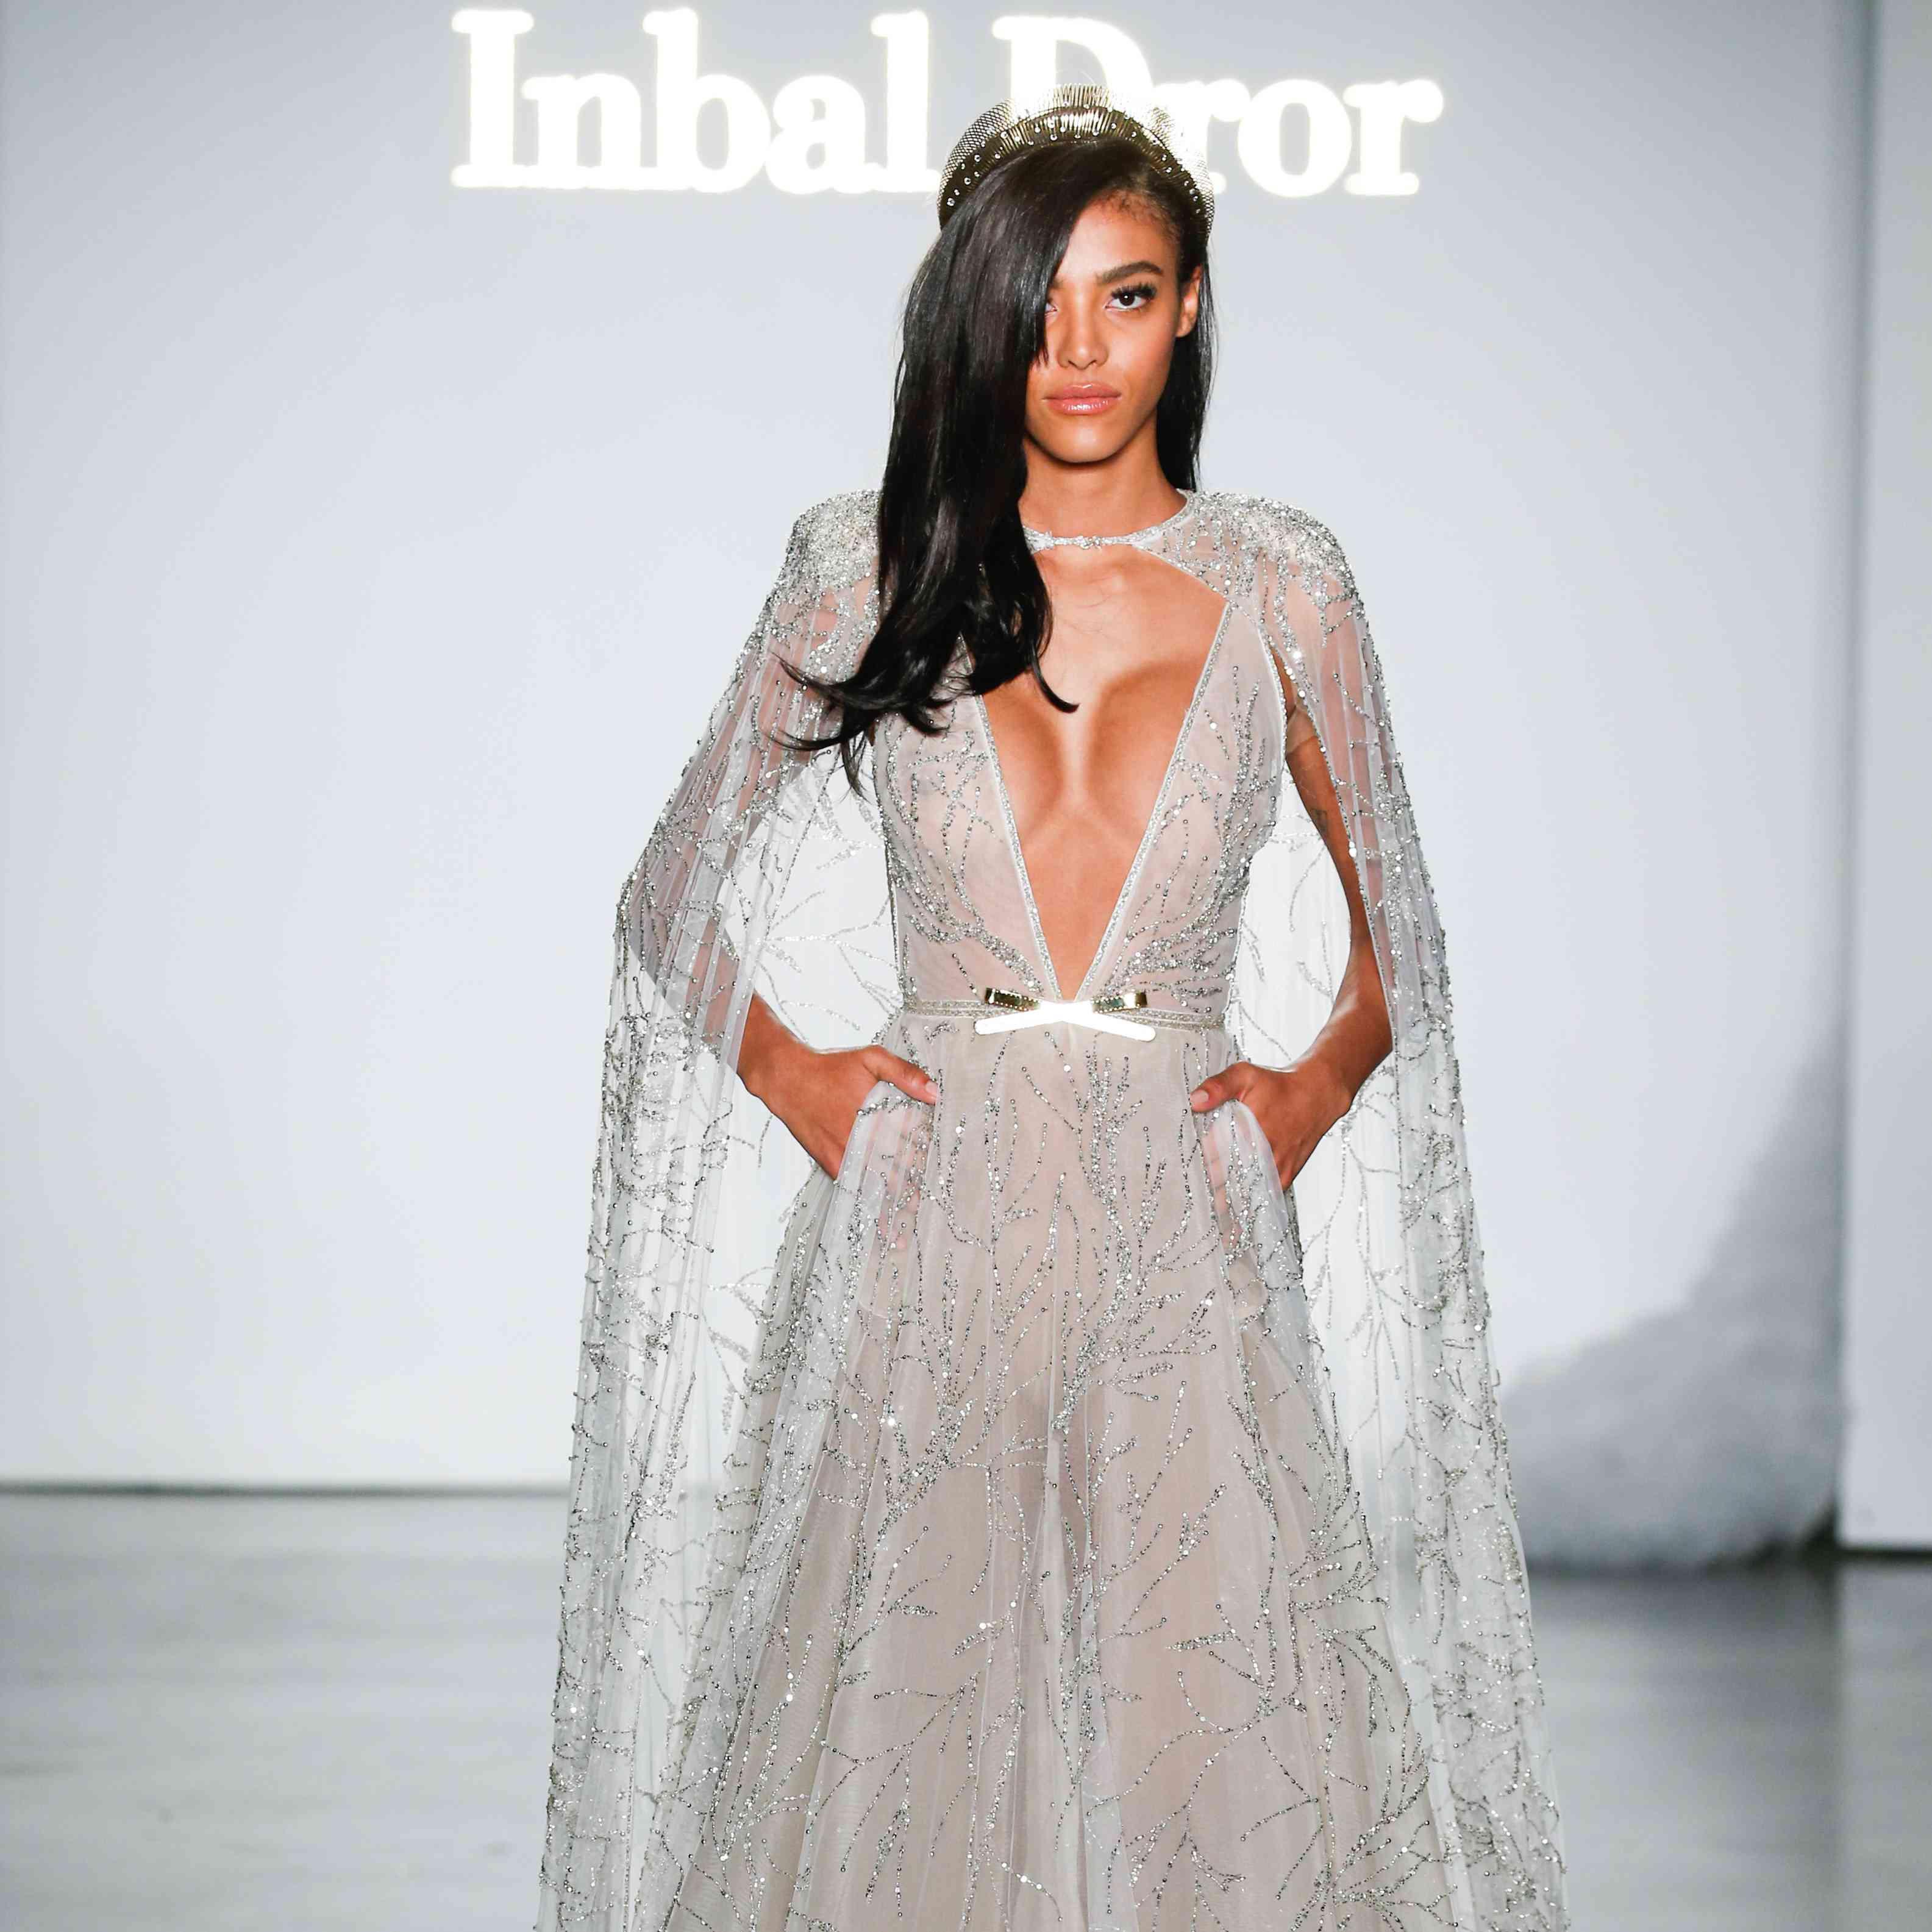 Fall Dresses 2020.Inbal Dror Bridal Wedding Dress Collection Fall 2020